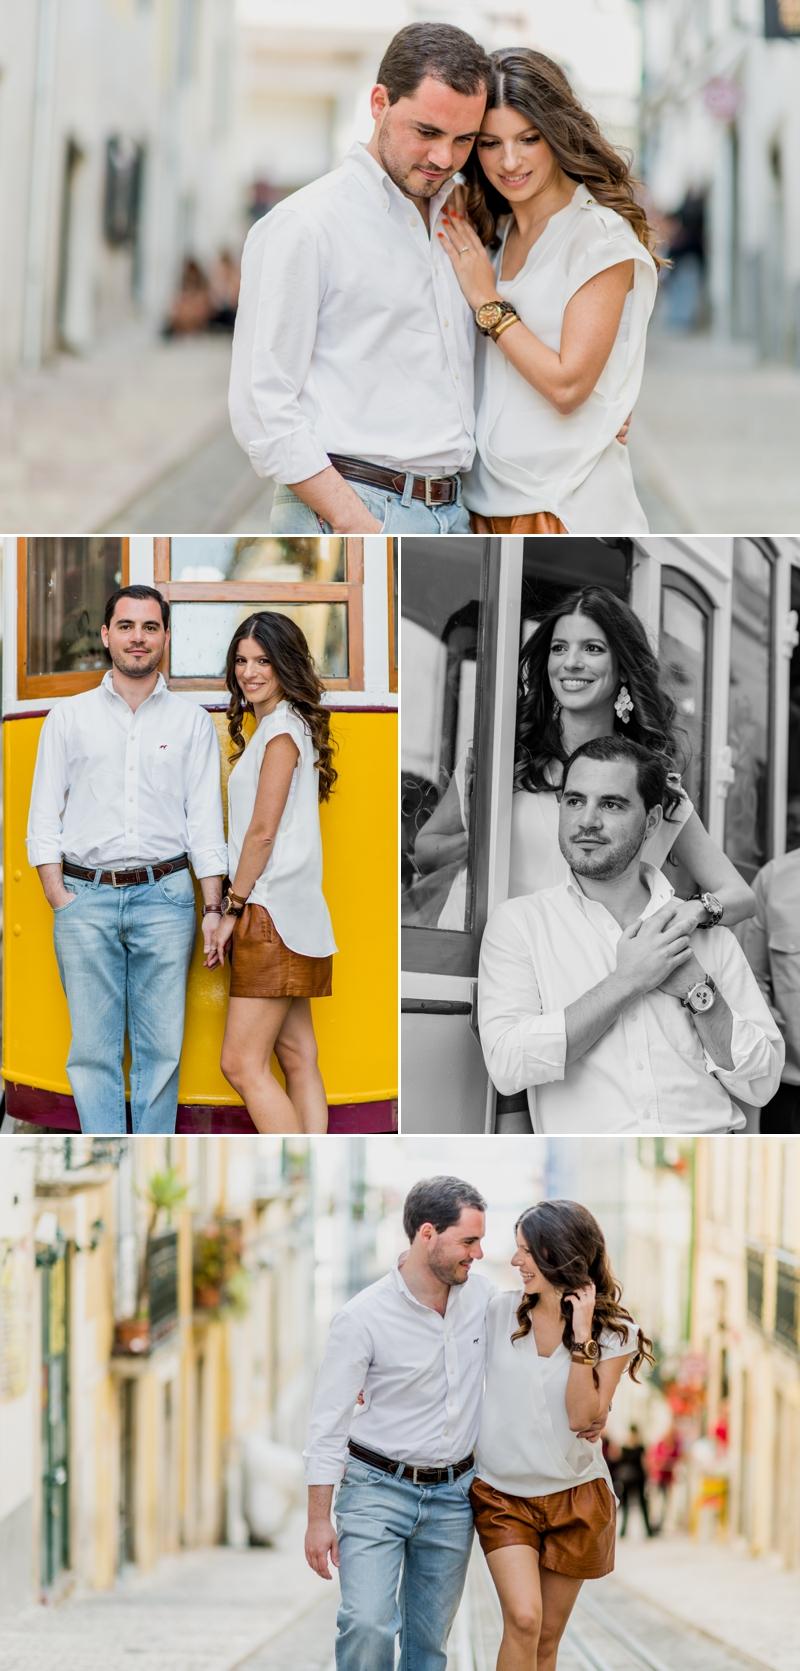 MR_Engagement_portuguese_wedding_photography-4.jpg